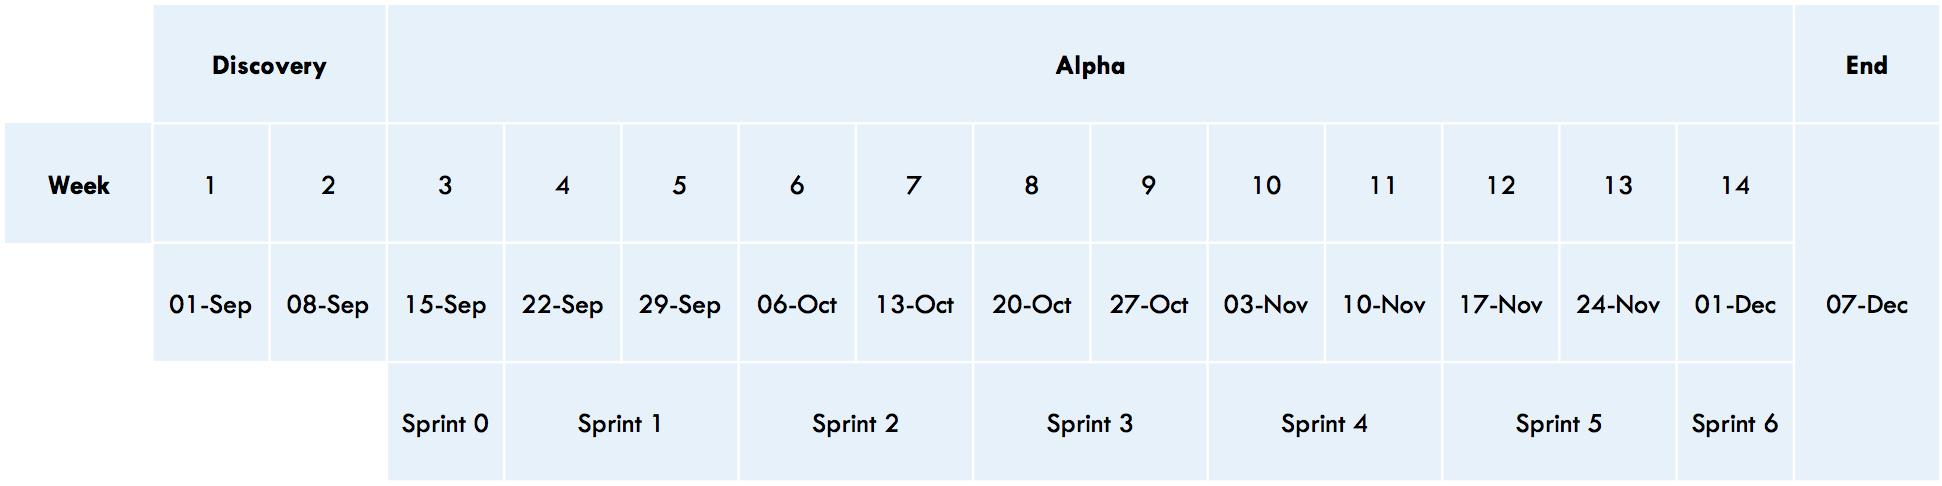 eQ Alpha Timeline Diagram